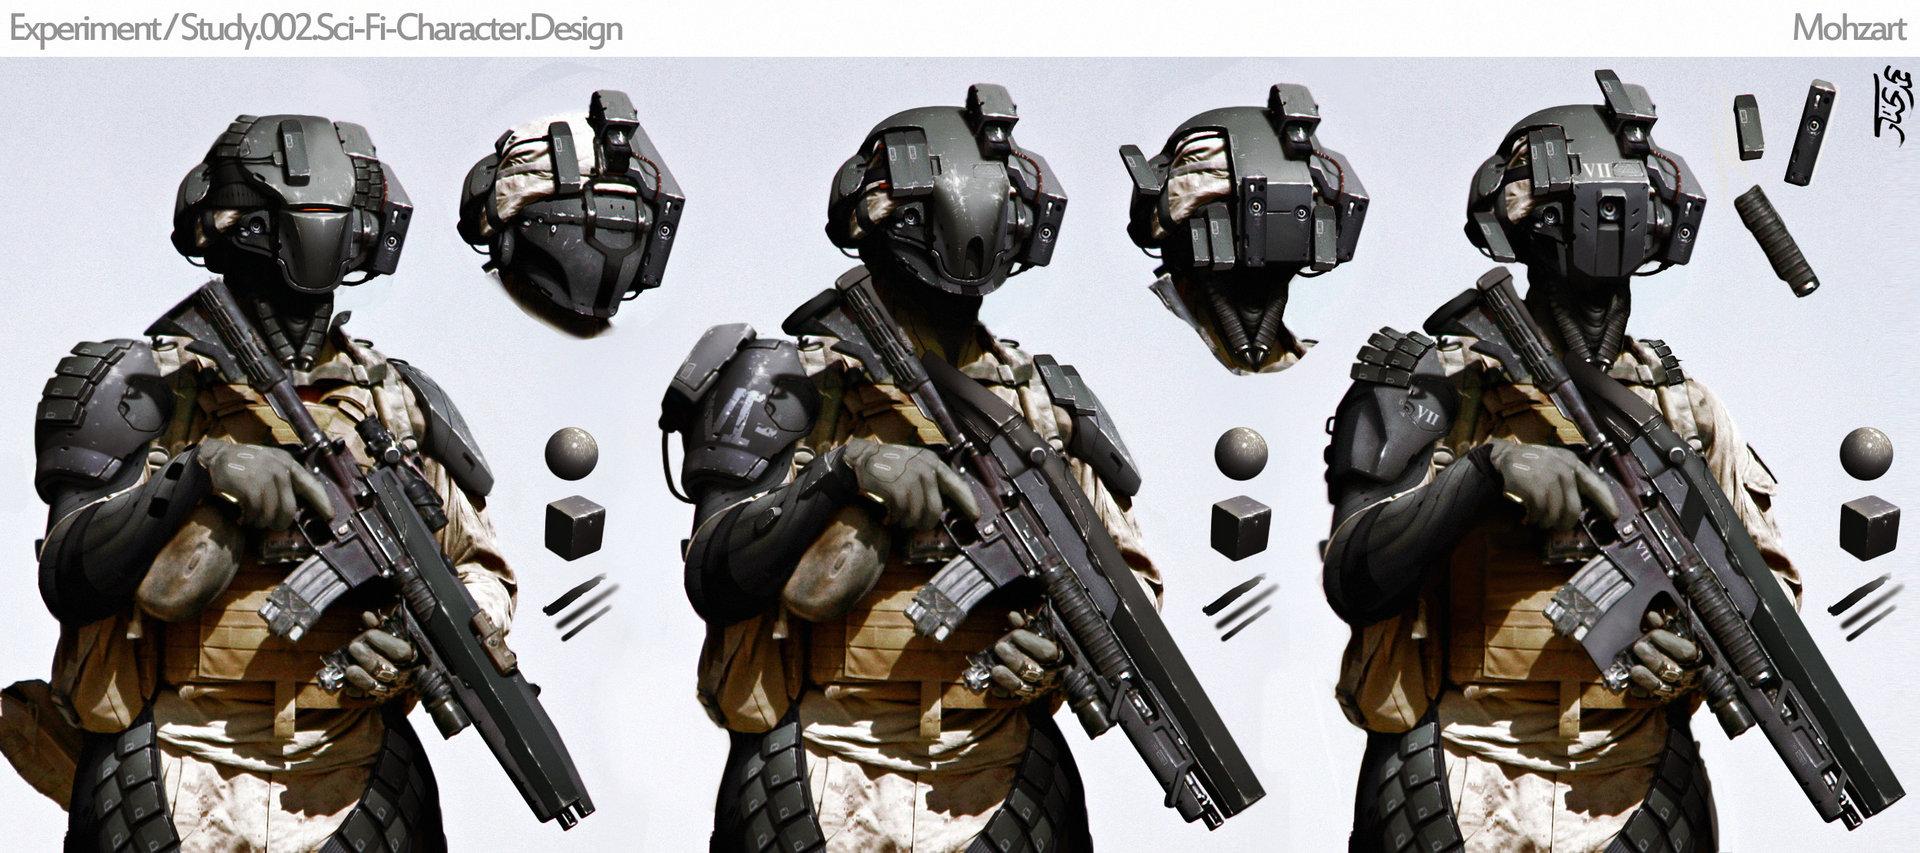 Mohzart experimental modern scifi character design